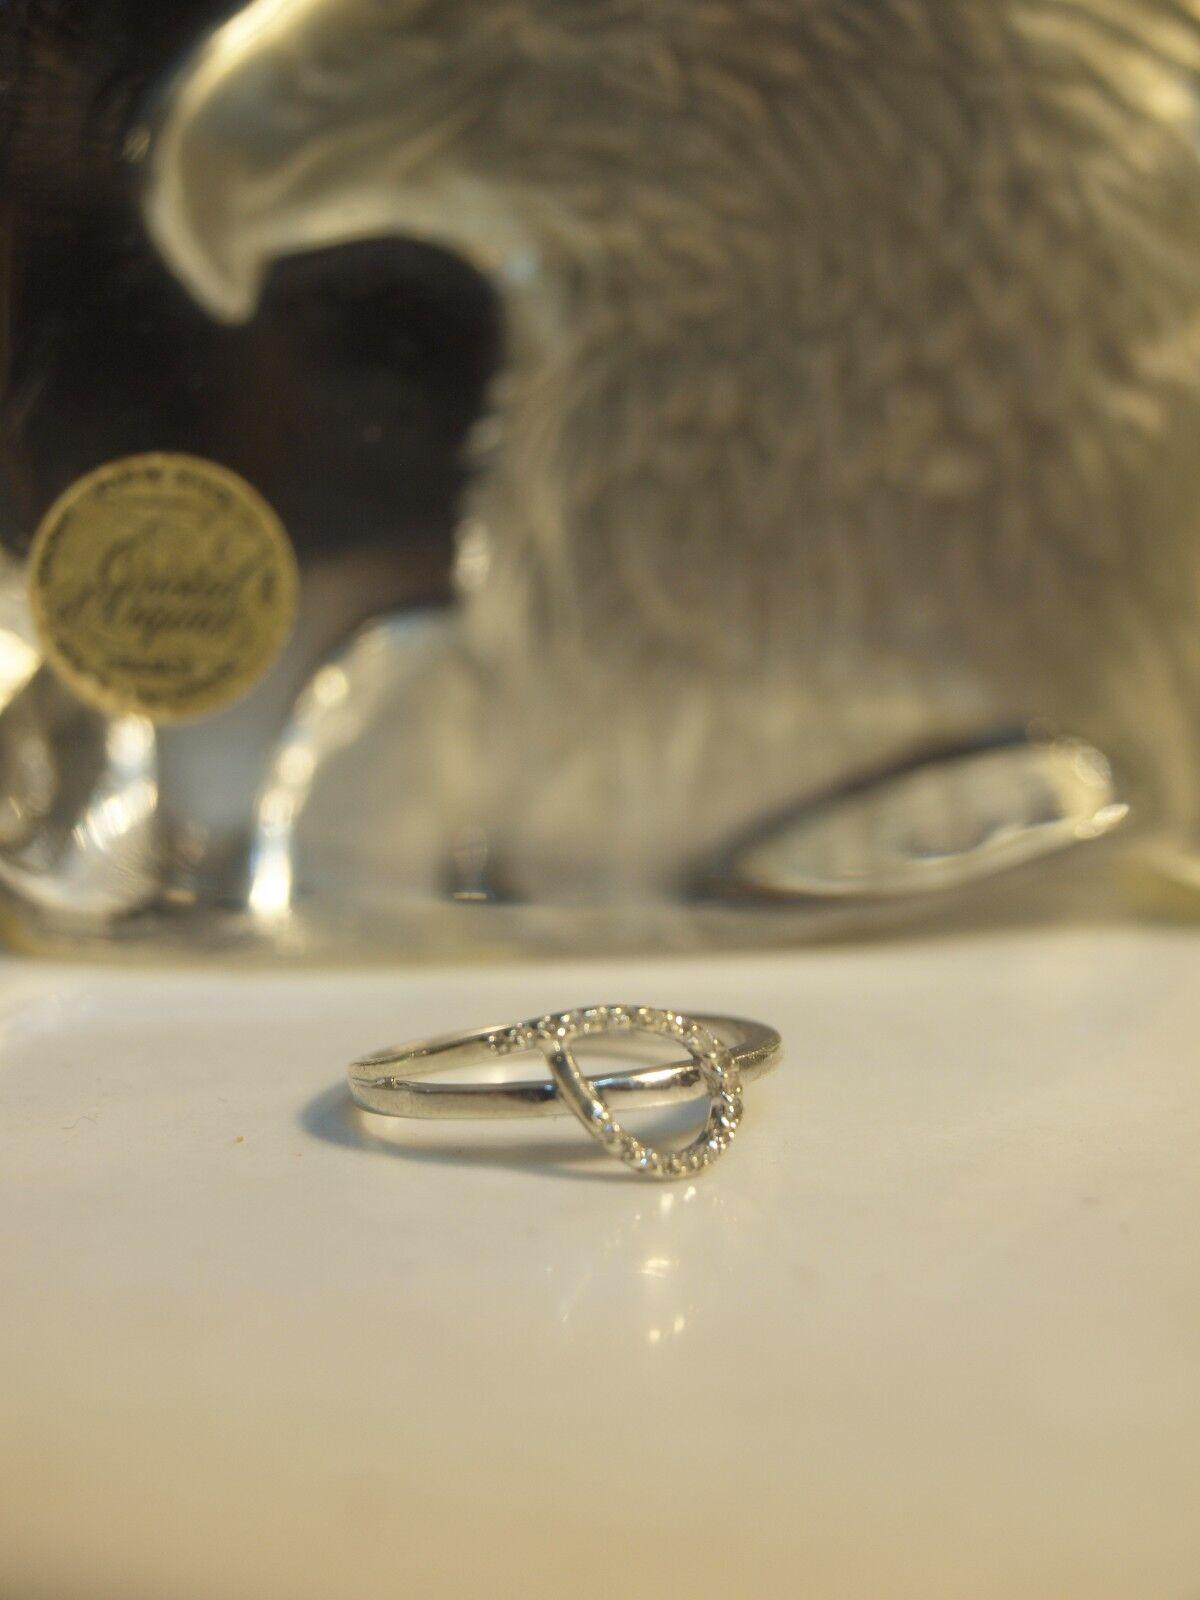 10K WHITE gold LADIES TWIRL DIAMOND RING SIZE   O   (0.19 CARAT DIAMONDS) 10K